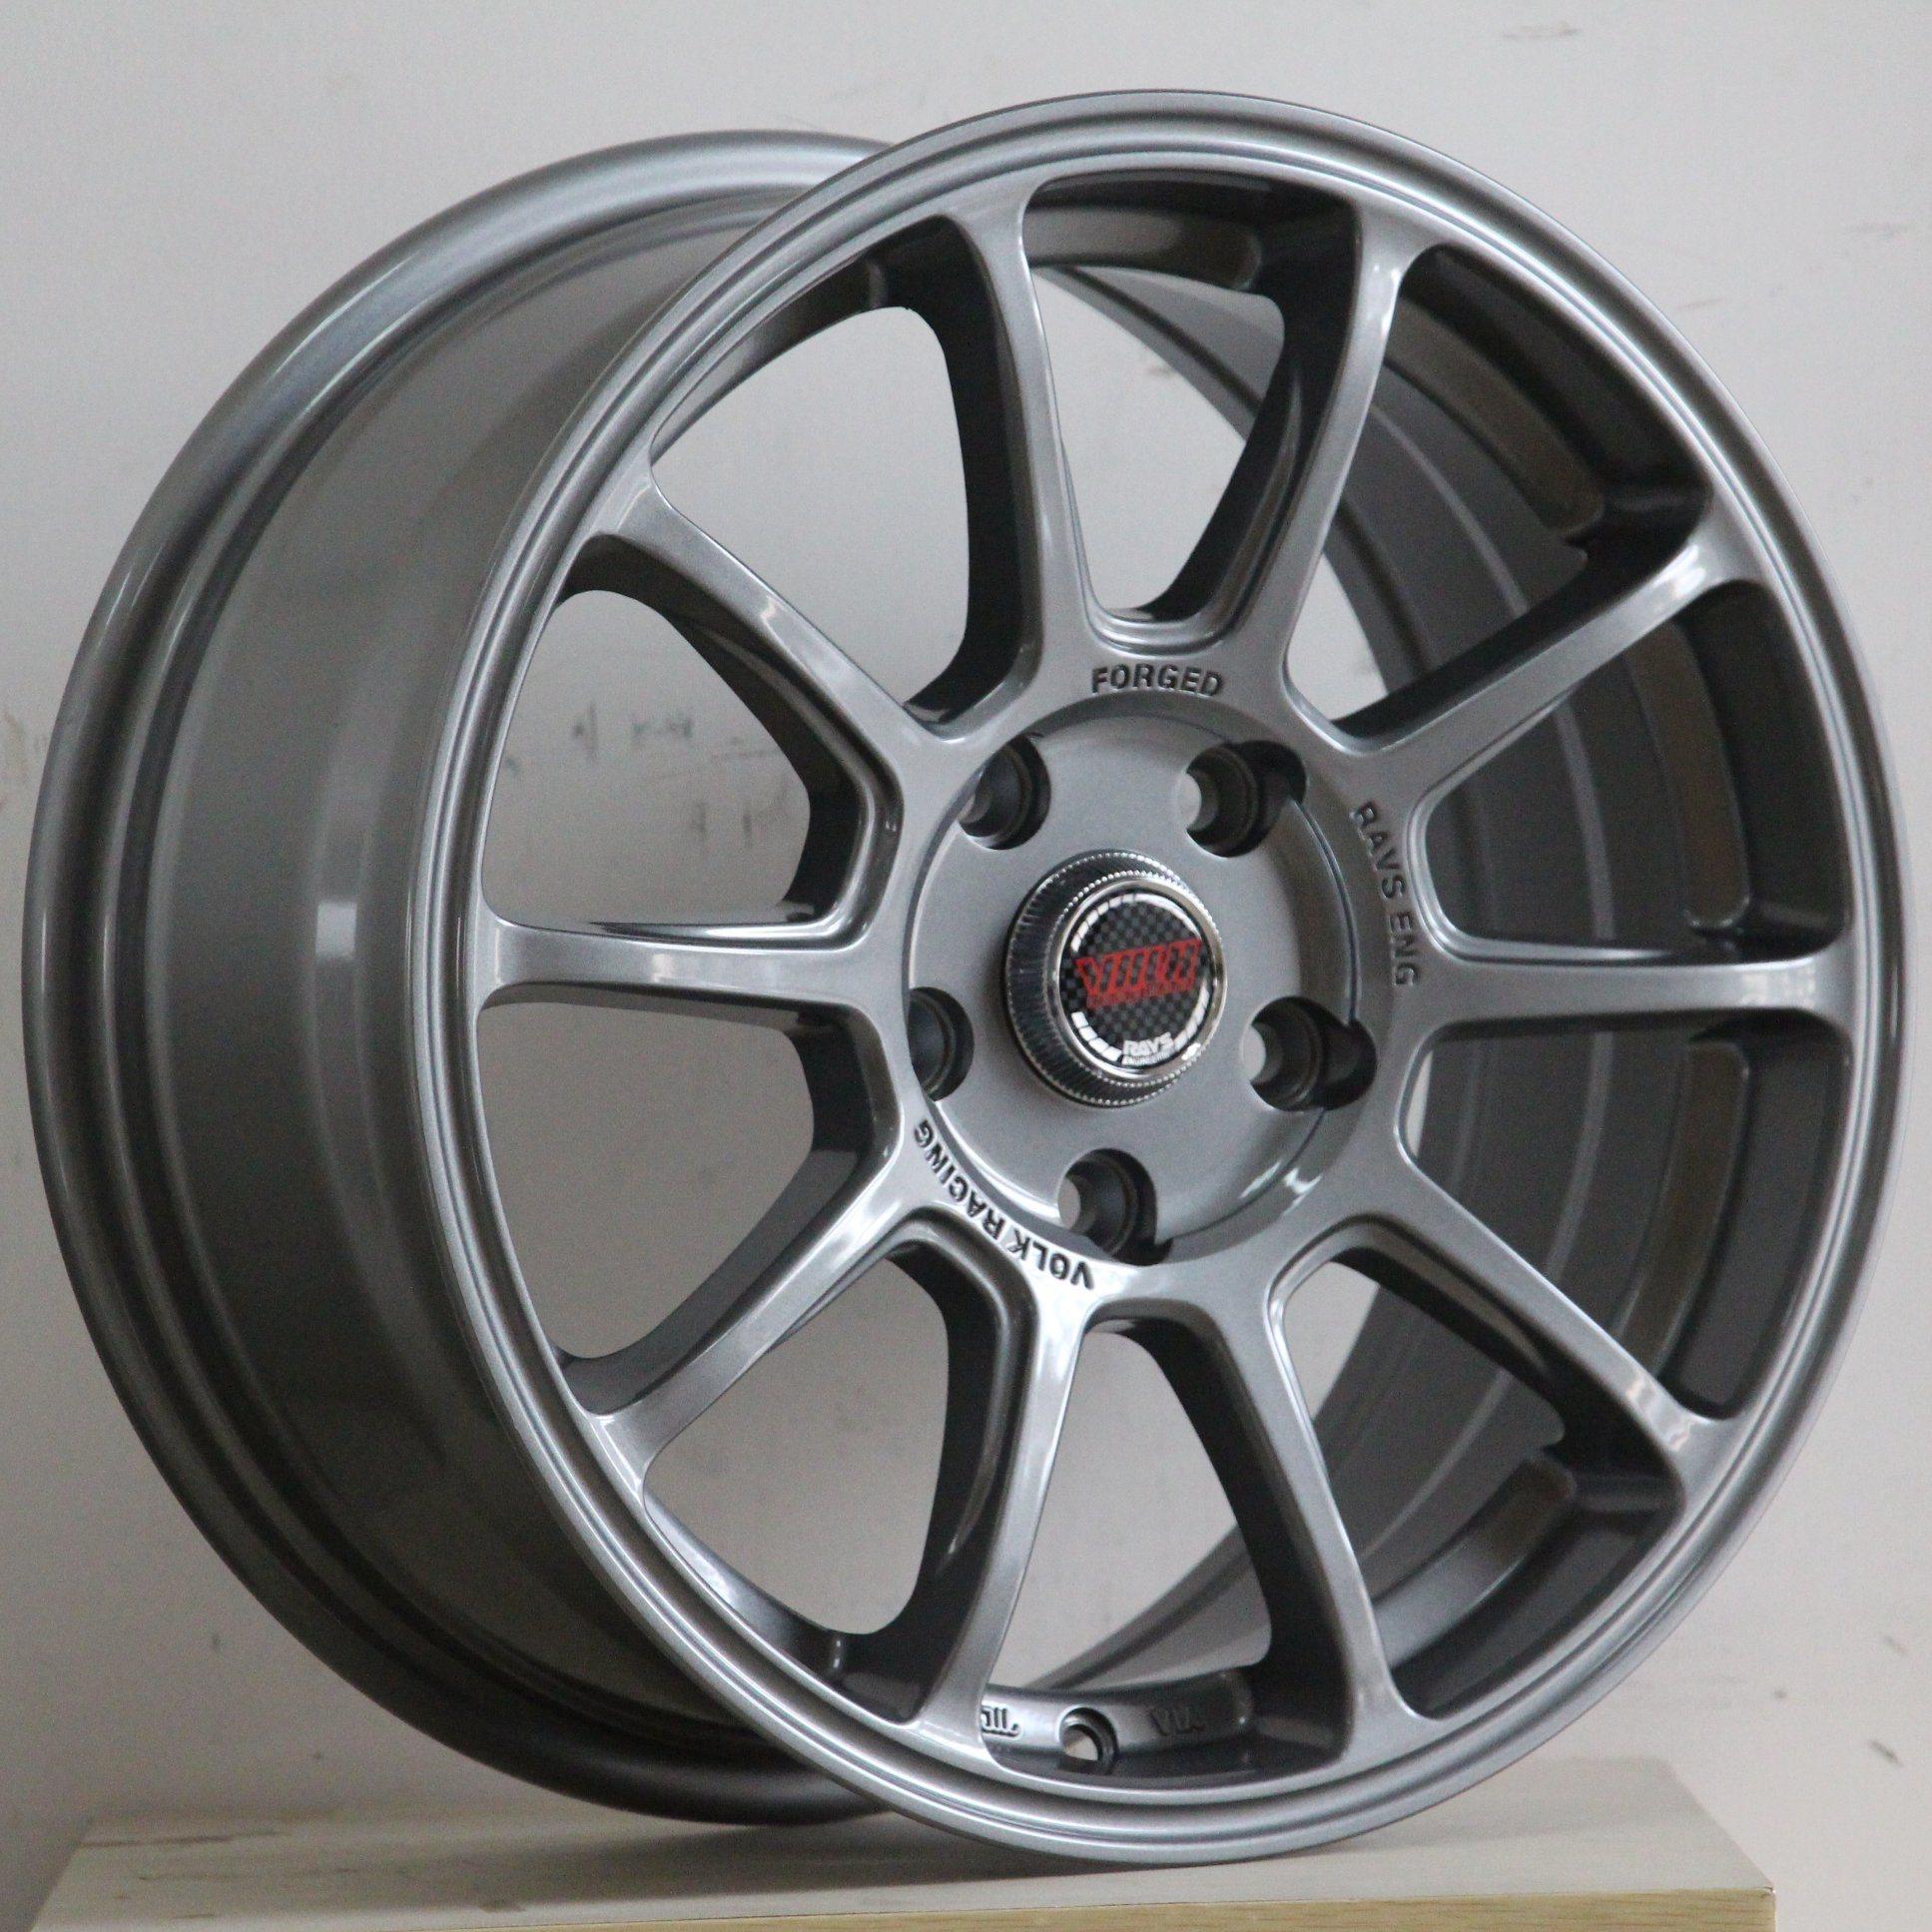 China 16 Inch 17 Inch Japan Rays Volk Racing Alloy Wheel Rims China Alloy Wheel Via Jwl Wheels